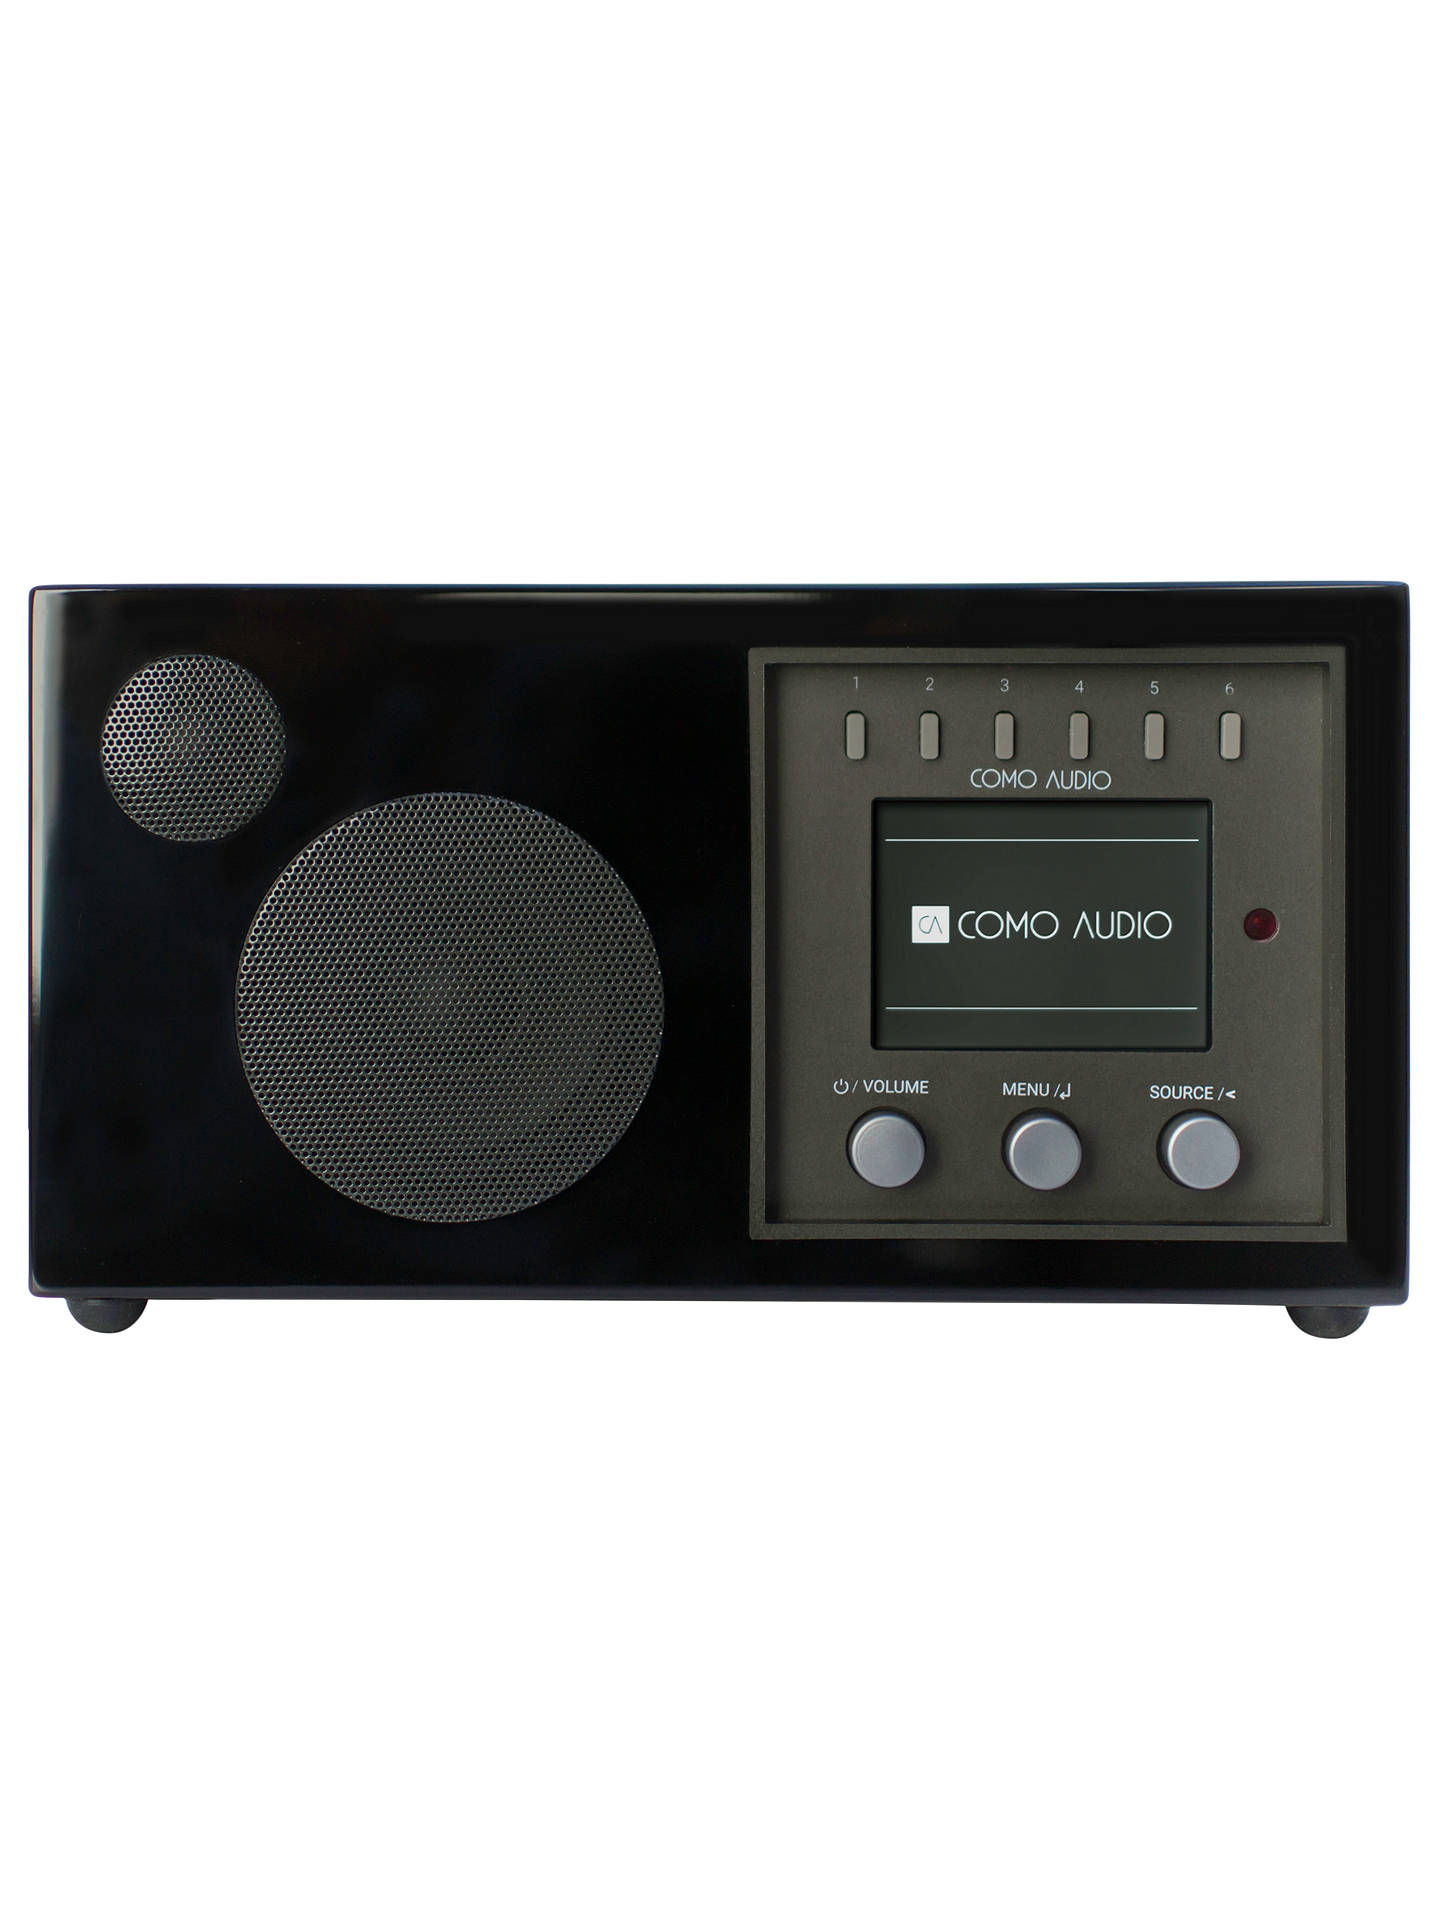 Como Audio Solo Dab Fm Internet Radio With Wi Fi Bluetooth Kit Digital Display Frequensi Counter Untuk Tuner Buycomo